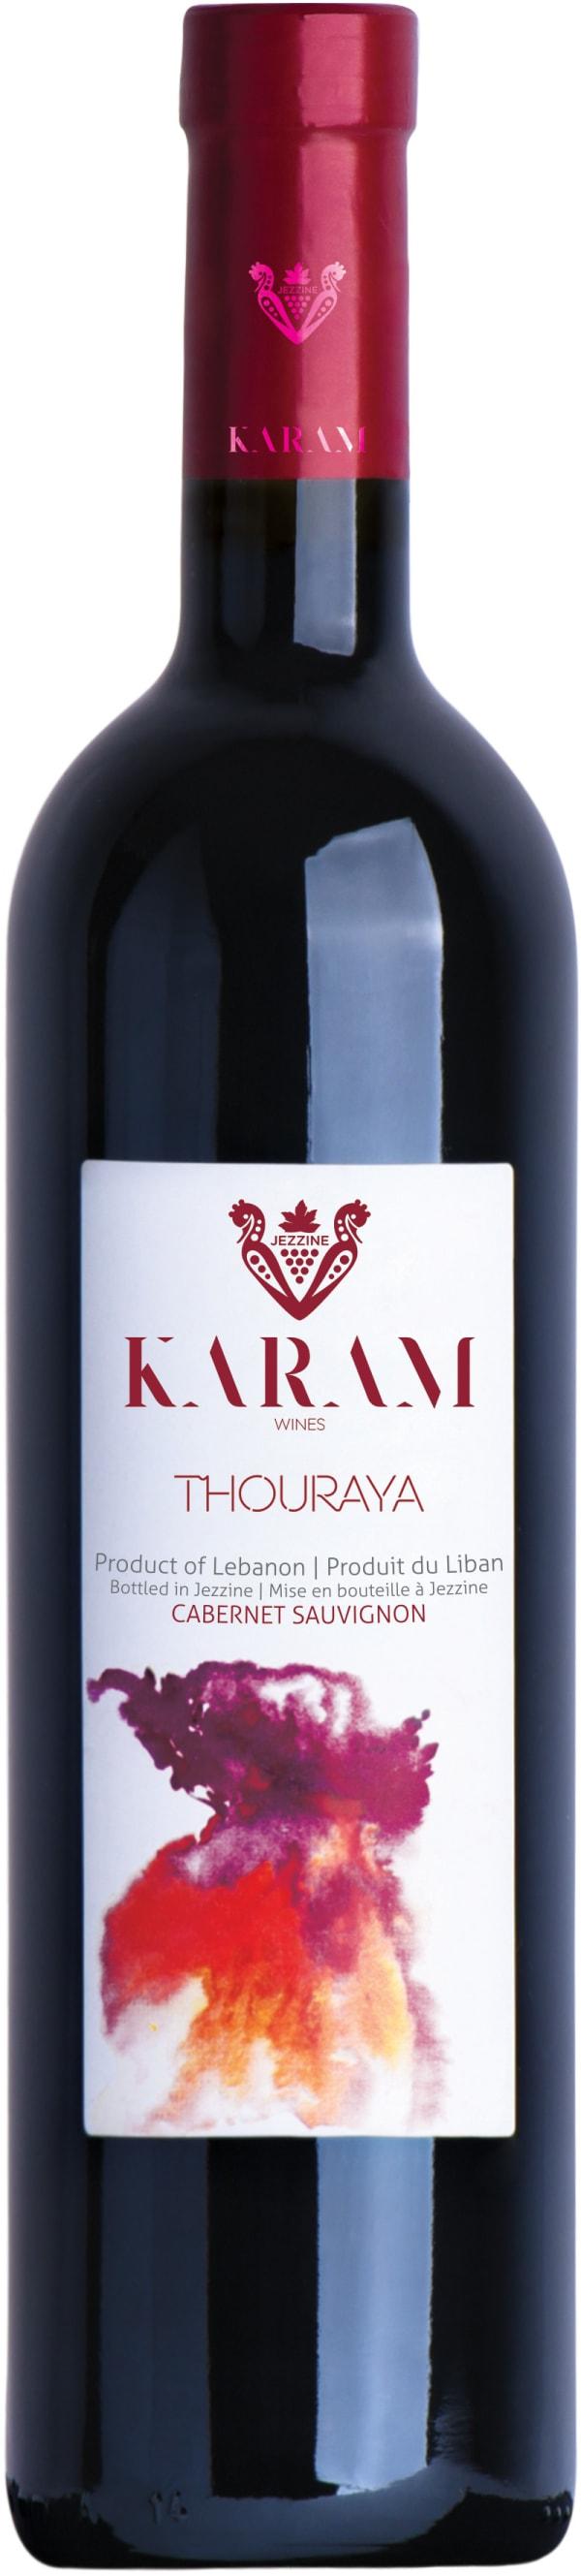 Karam Thouraya Cabernet Sauvignon 2013